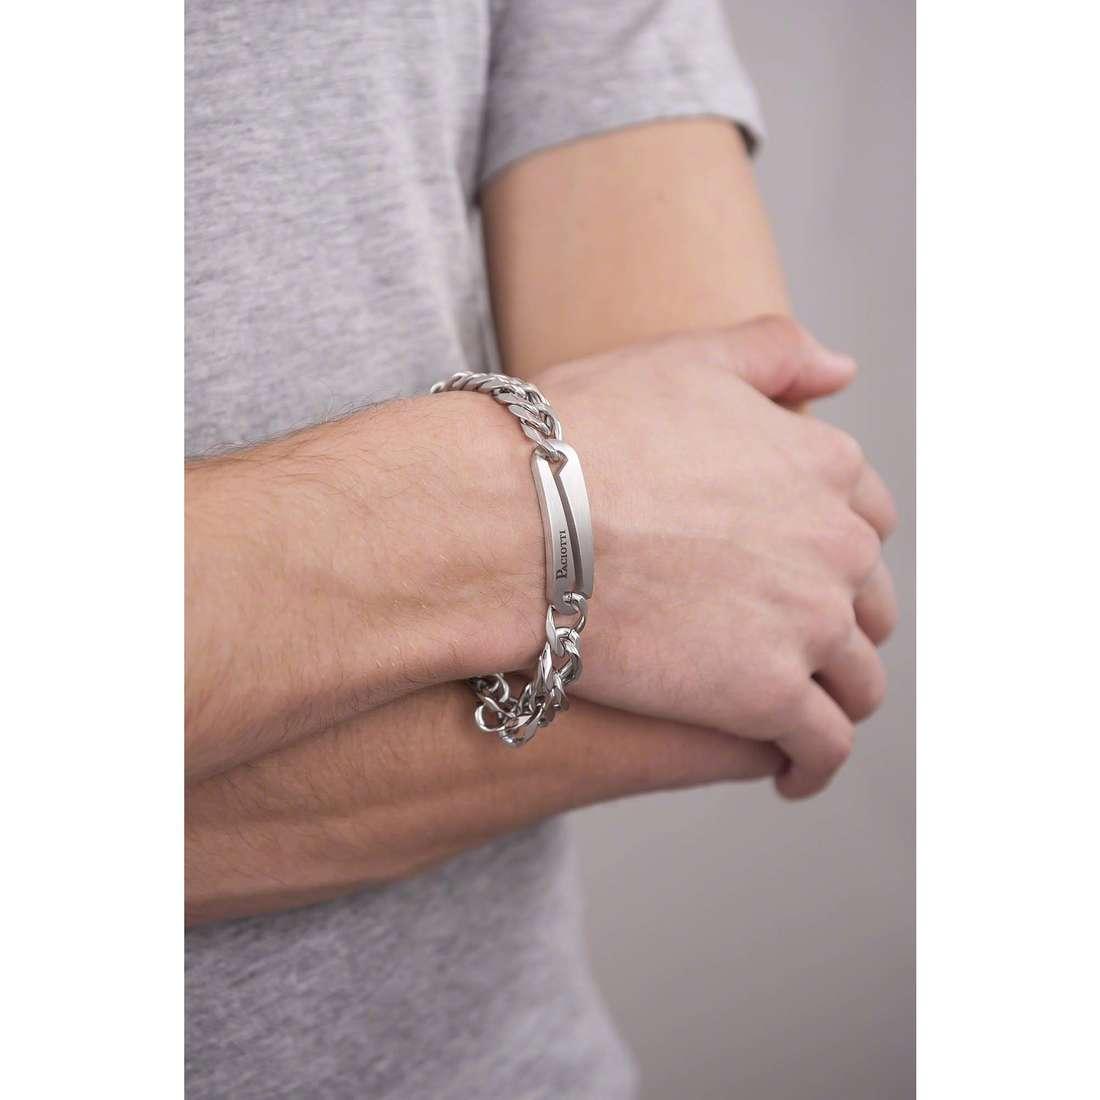 4US Cesare Paciotti bracciali Steel uomo 4UBR1314 indosso